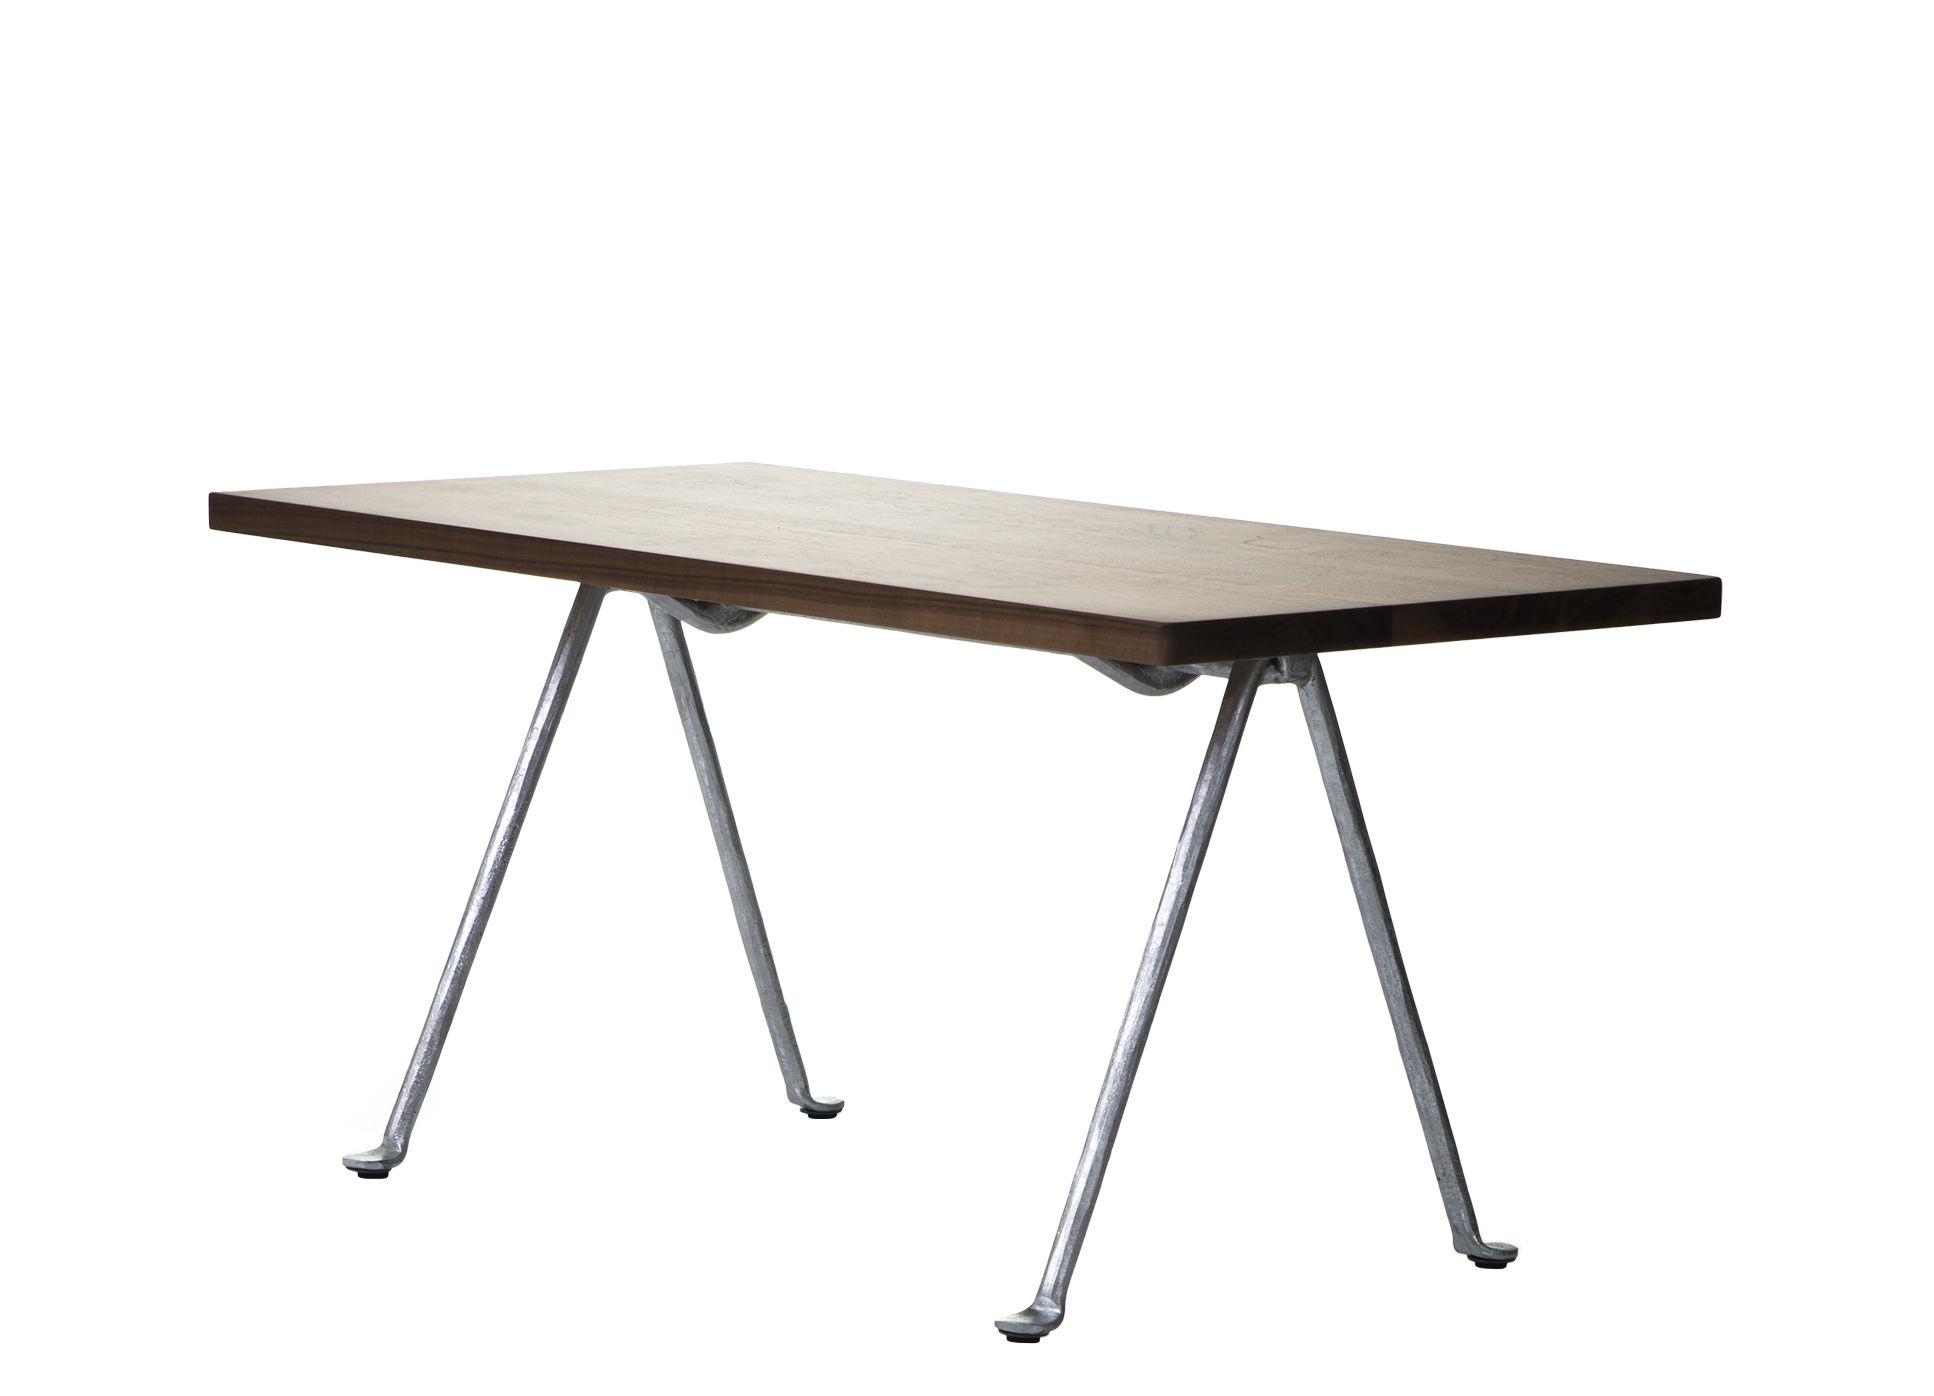 Mobilier - Tables basses - Table basse Officina / 120 x 45 cm - Noyer & fer forgé - Magis - Noyer / Pieds galvanisés - Fer forgé galvanisé, Noyer américain massif